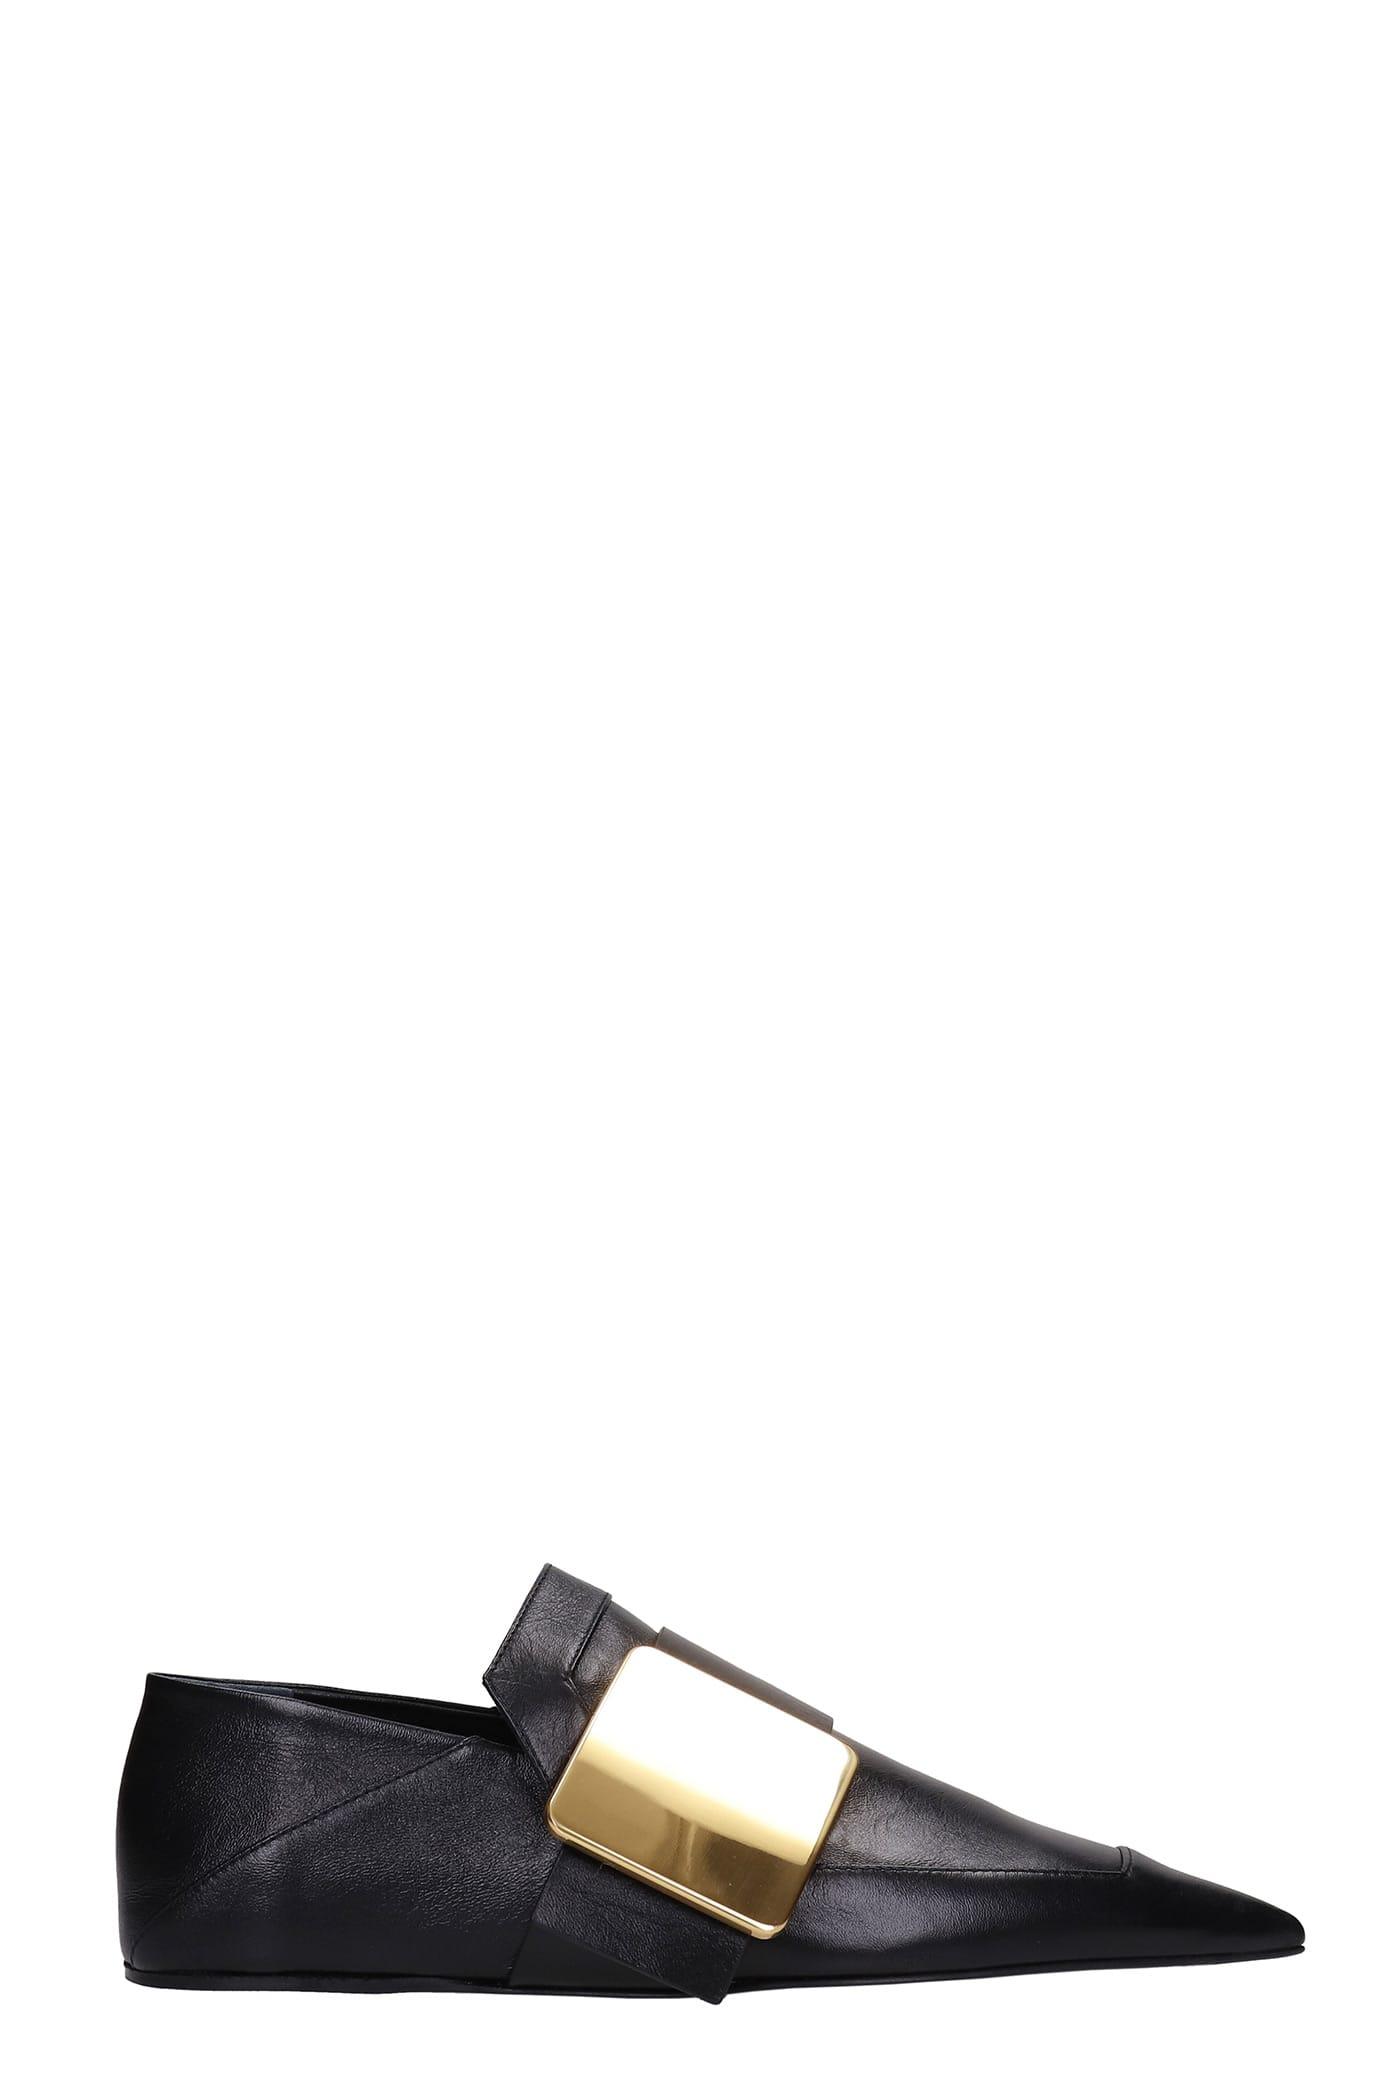 Buy Jil Sander Loafers In Black Leather online, shop Jil Sander shoes with free shipping